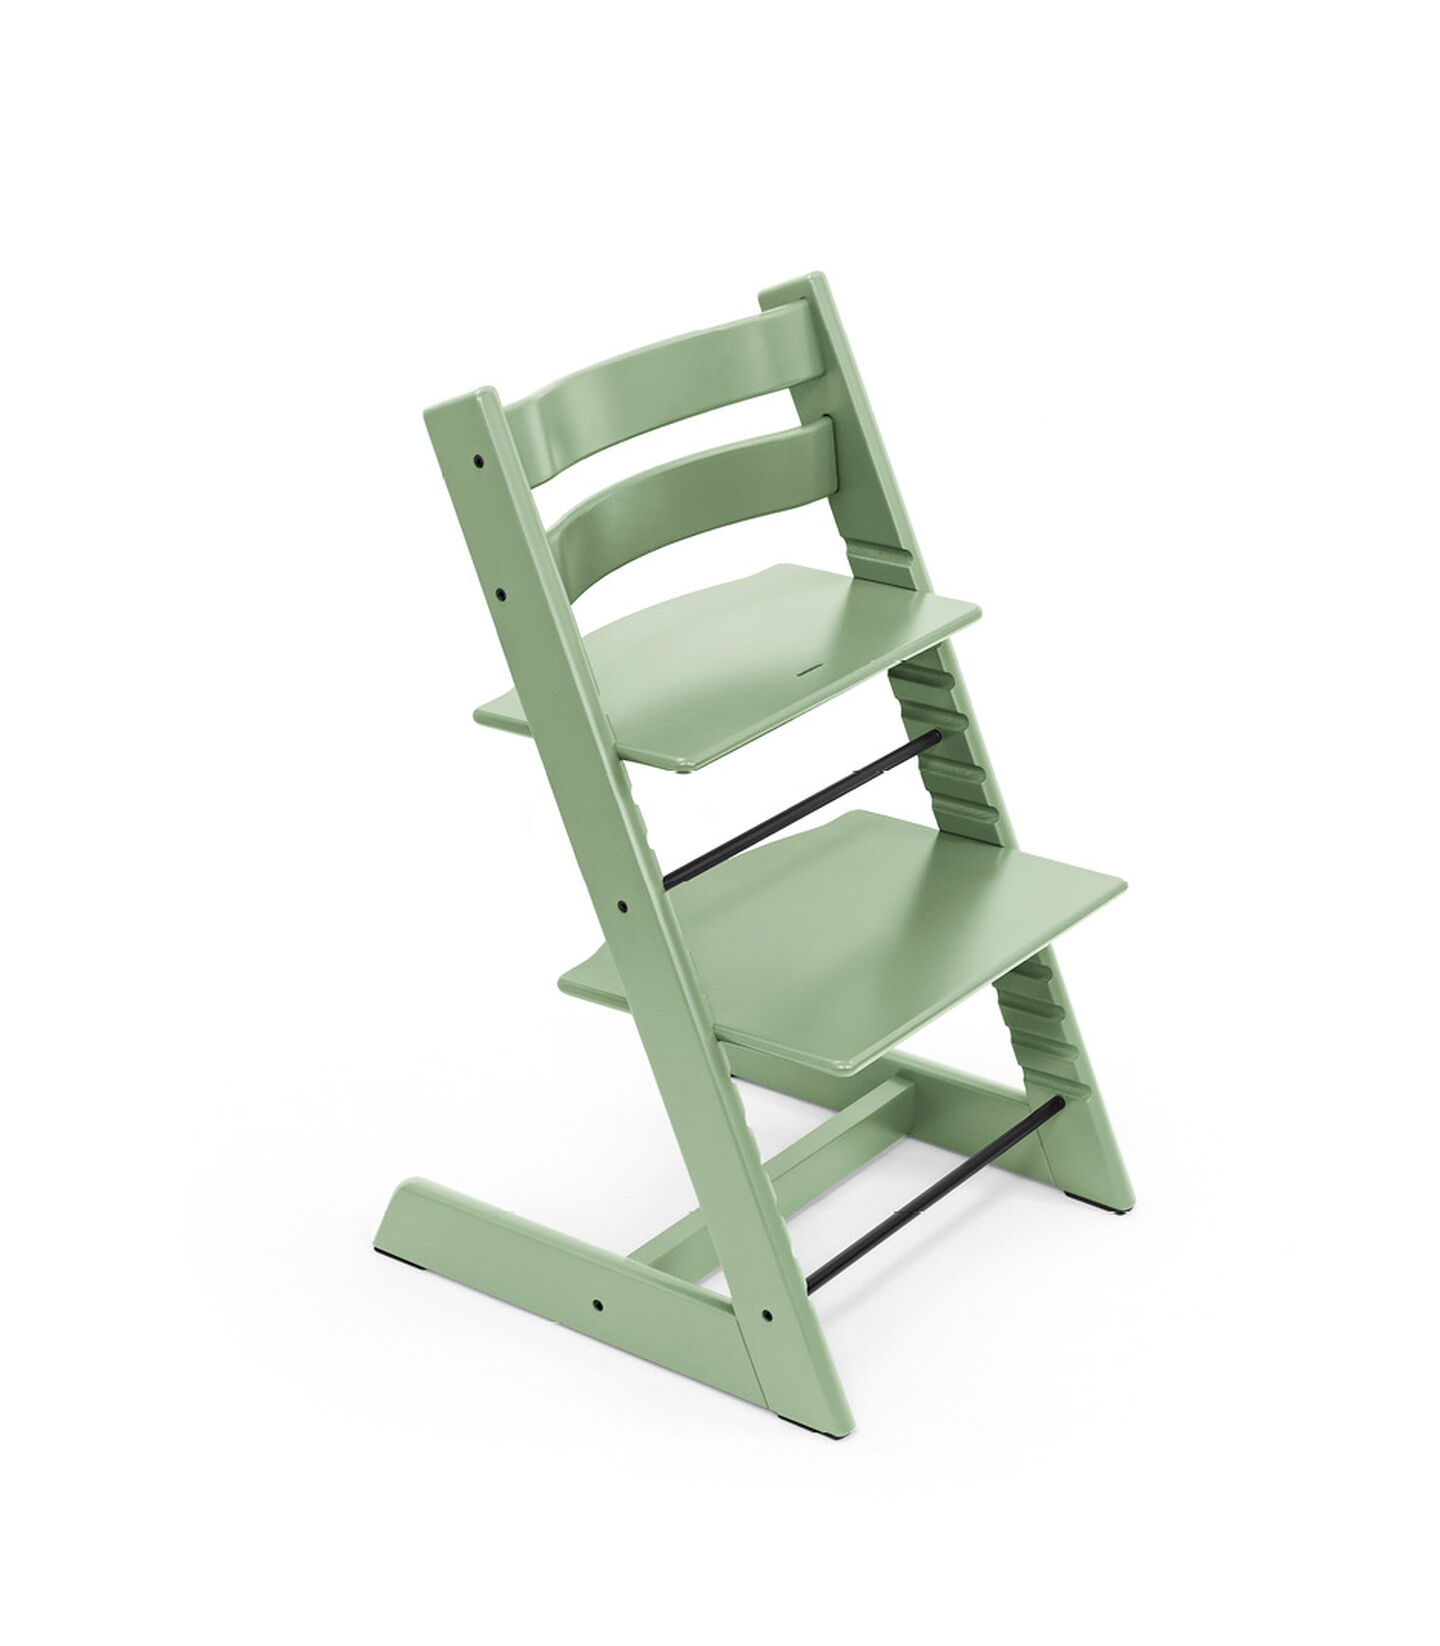 Tripp Trapp® Chair Moss Green, Moss Green, mainview view 2